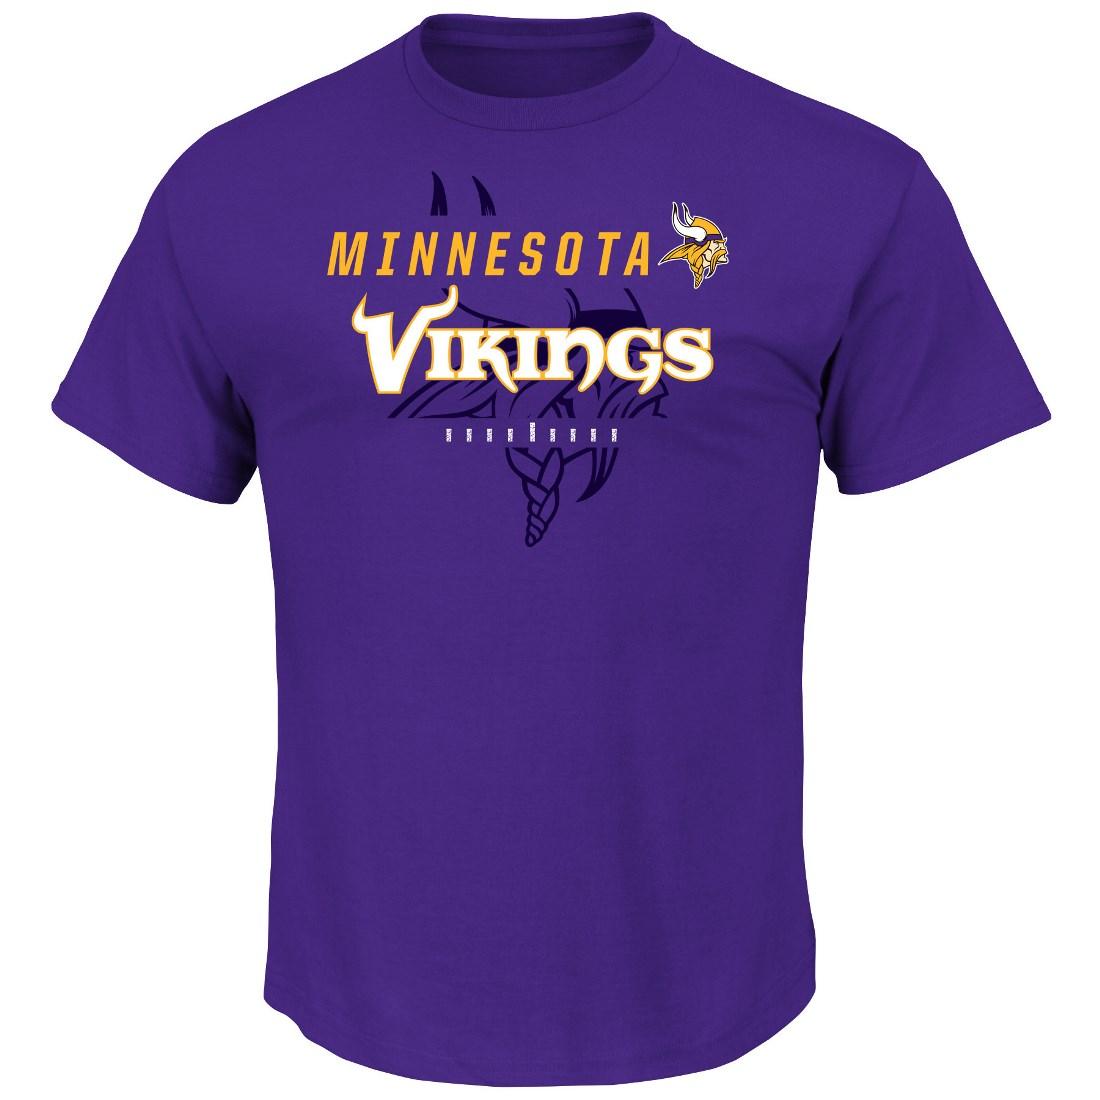 "Minnesota Vikings Majestic NFL ""Of Great Value"" Men's Short Sleeve T-Shirt"